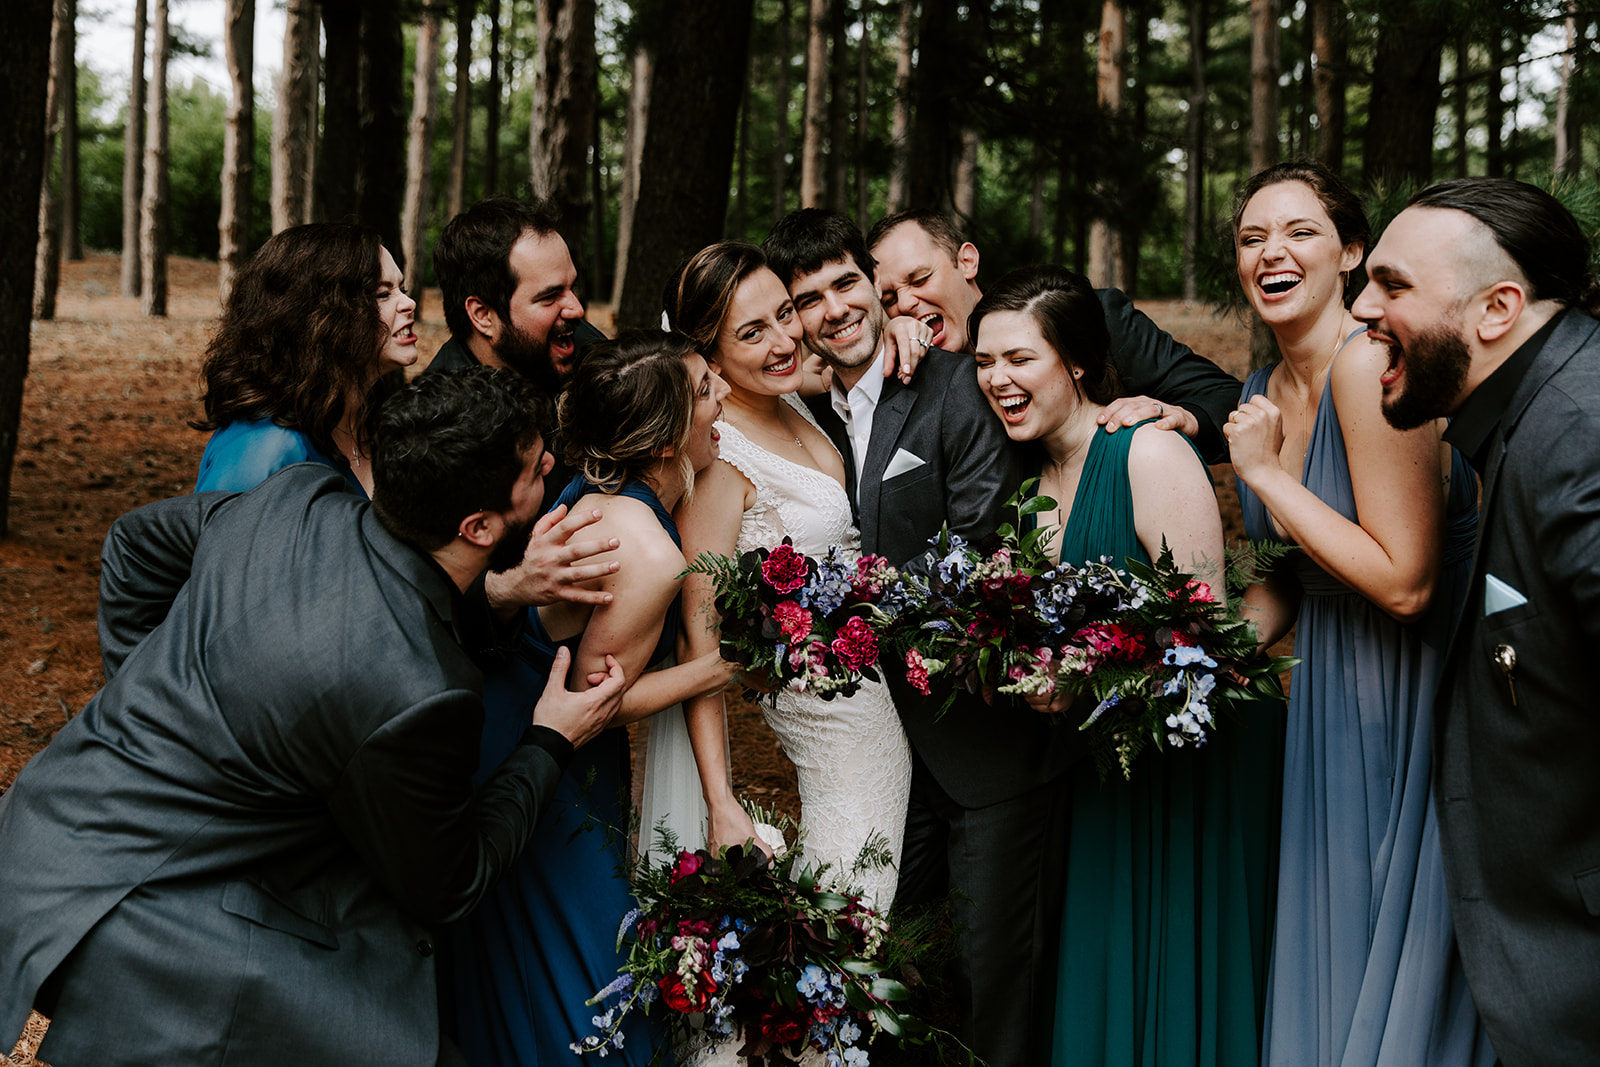 2019-06-01-00-Lindsey+Mat-05_Wedding_Party-meandhimphoto-0070-T5D18675.jpg